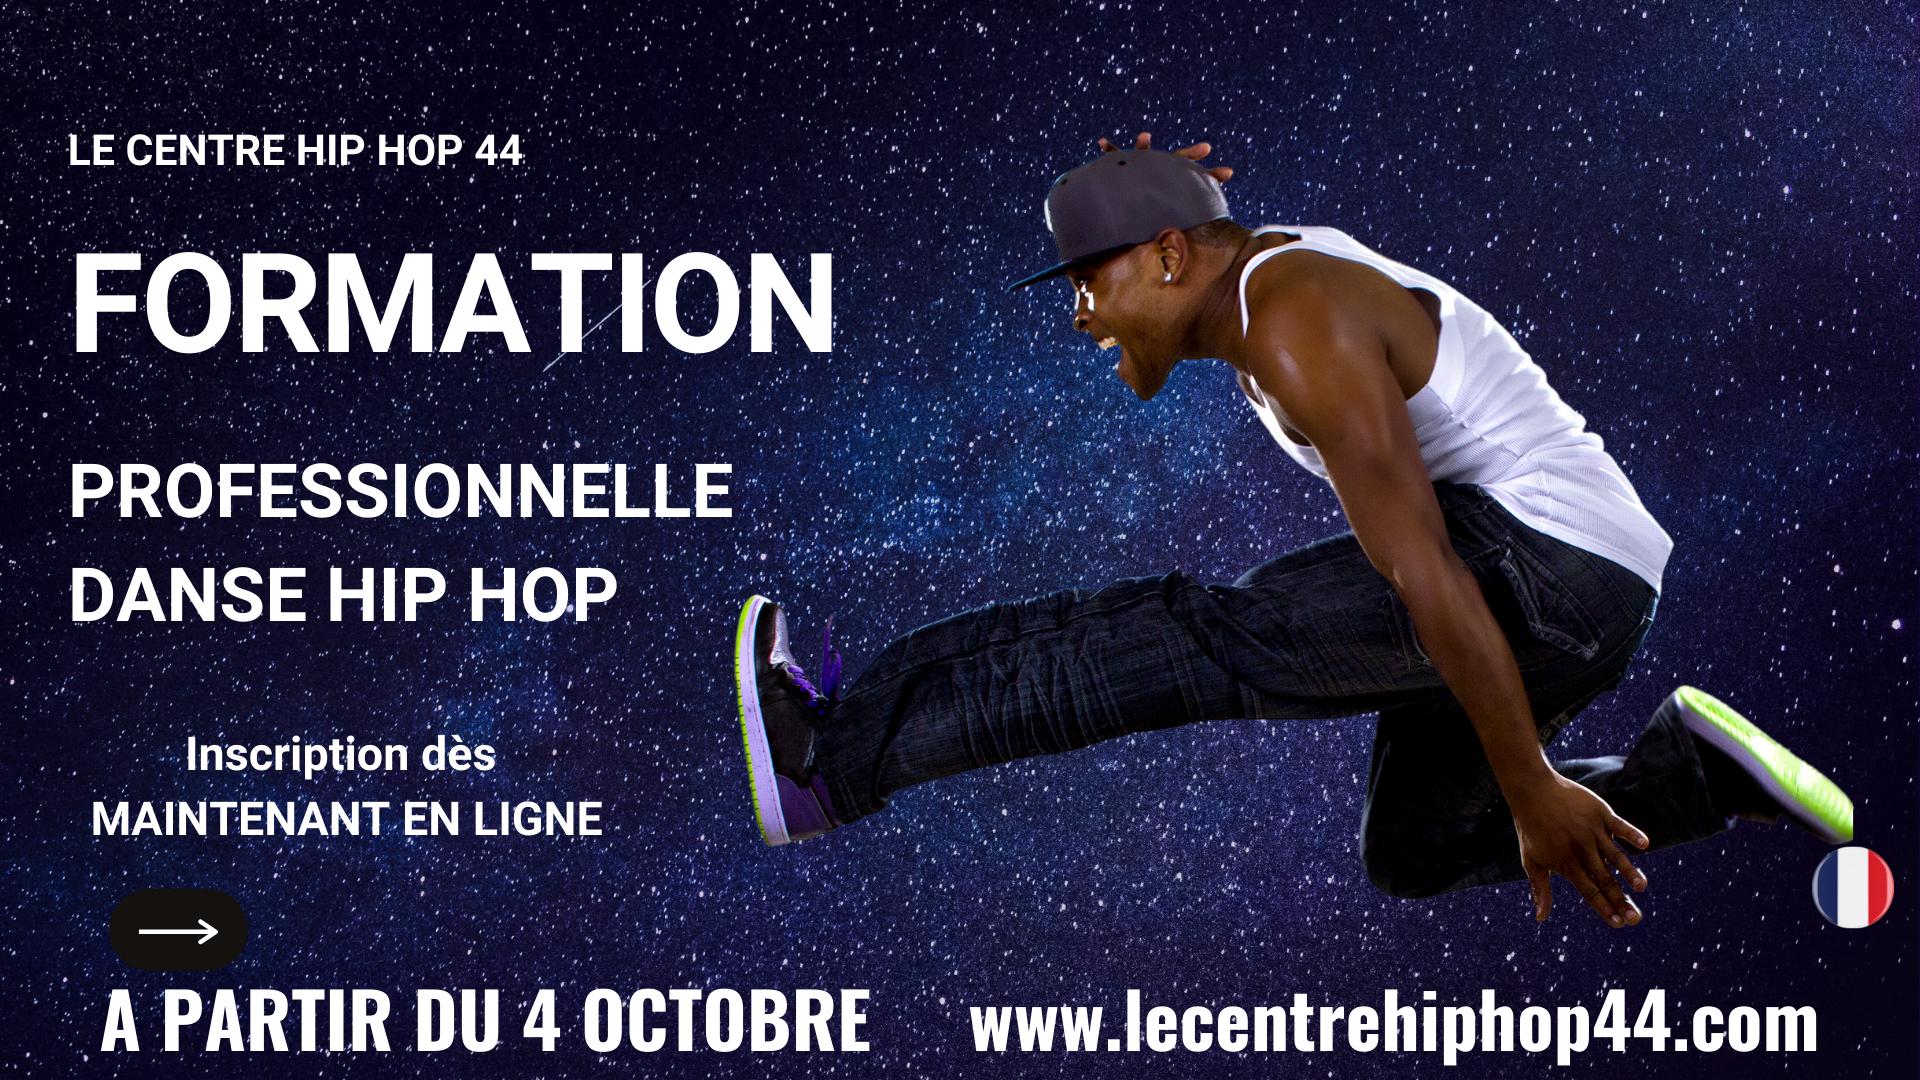 Formation pro danse hip hop